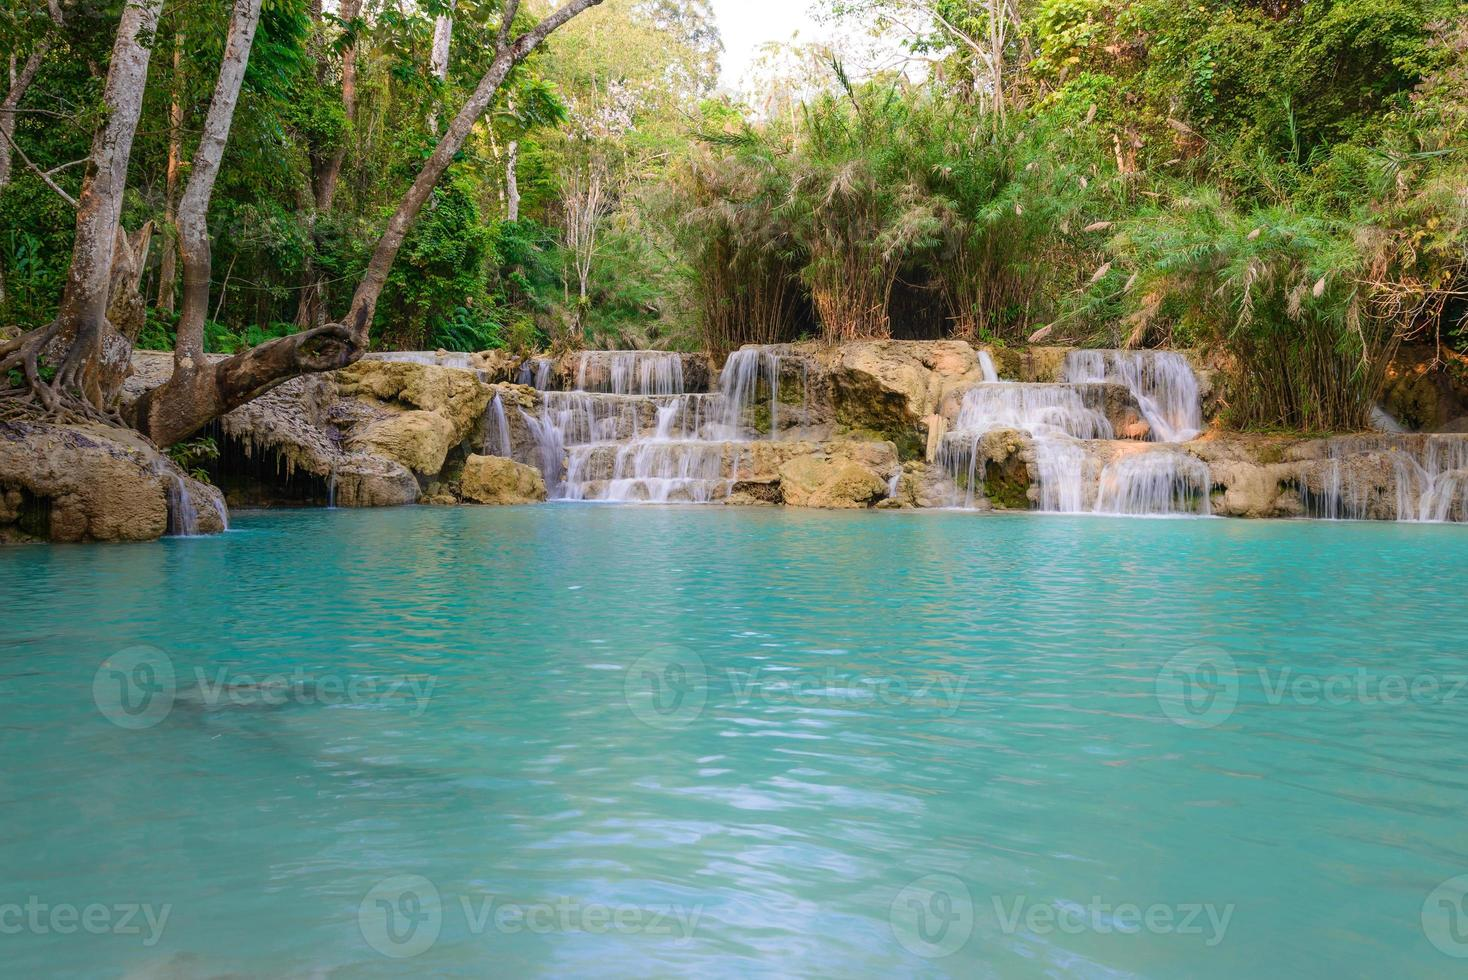 Cascada de kouangxi en luang prabang en laos. foto